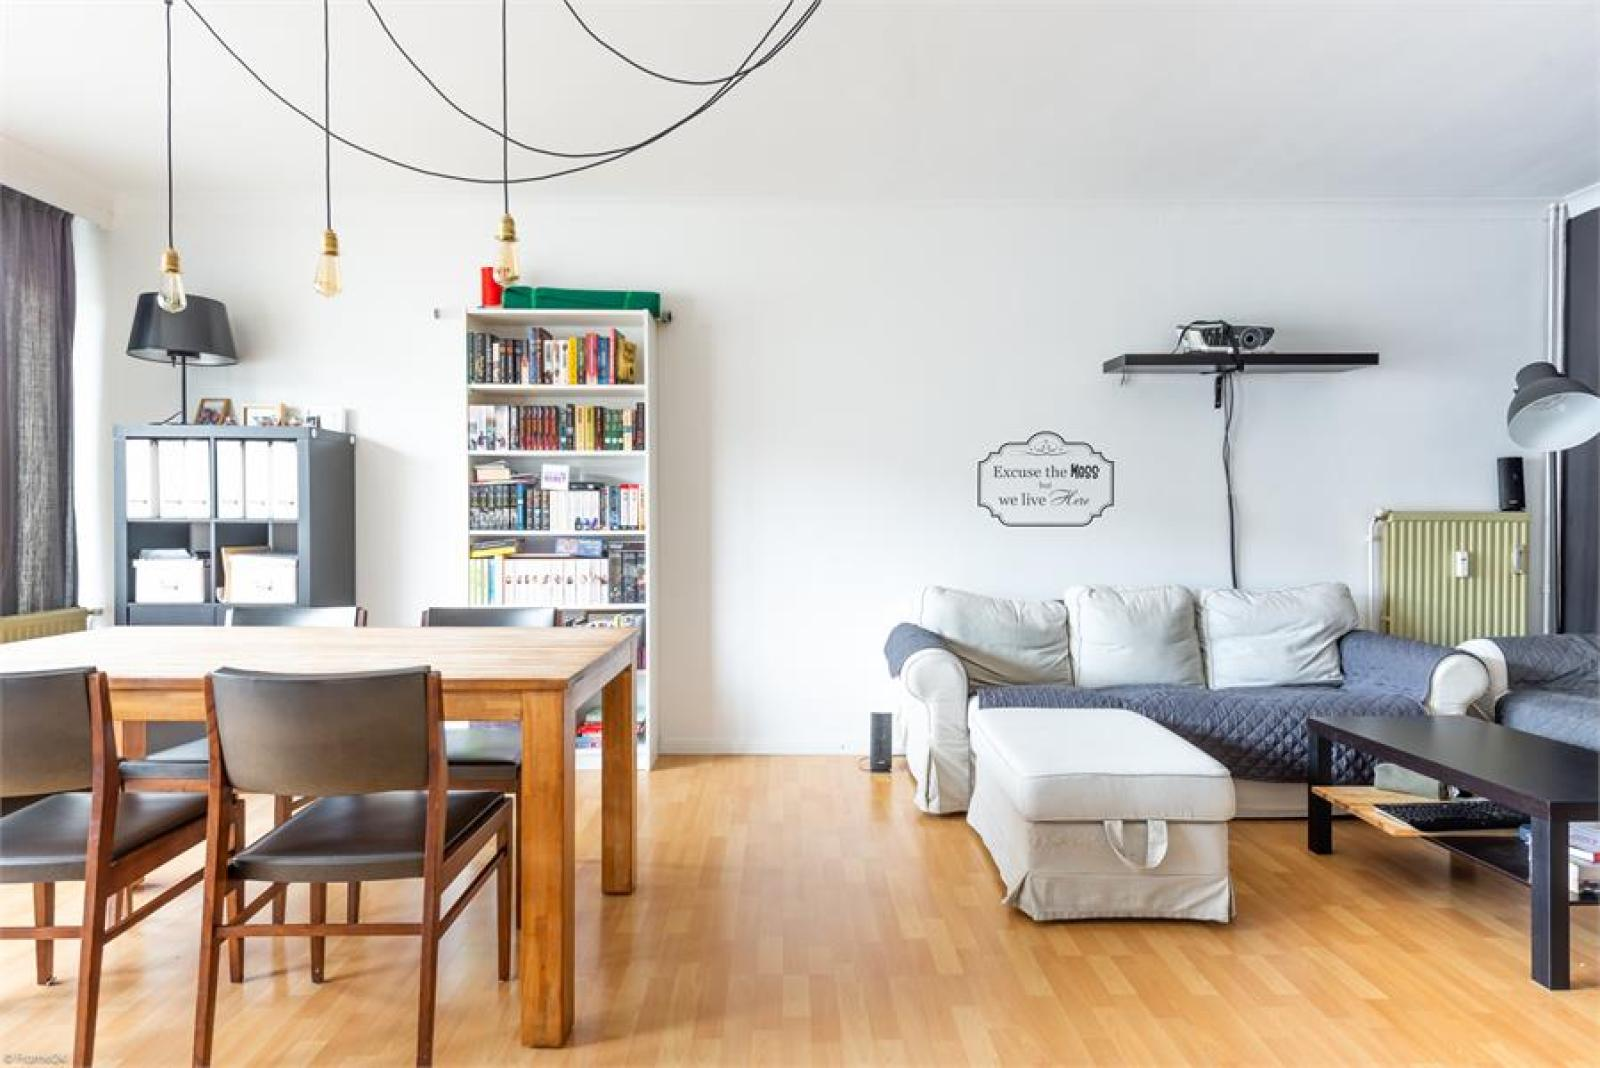 Instapklaar appartement (77 m²) met twee slaapkamers op centrale ligging te Deurne! afbeelding 1